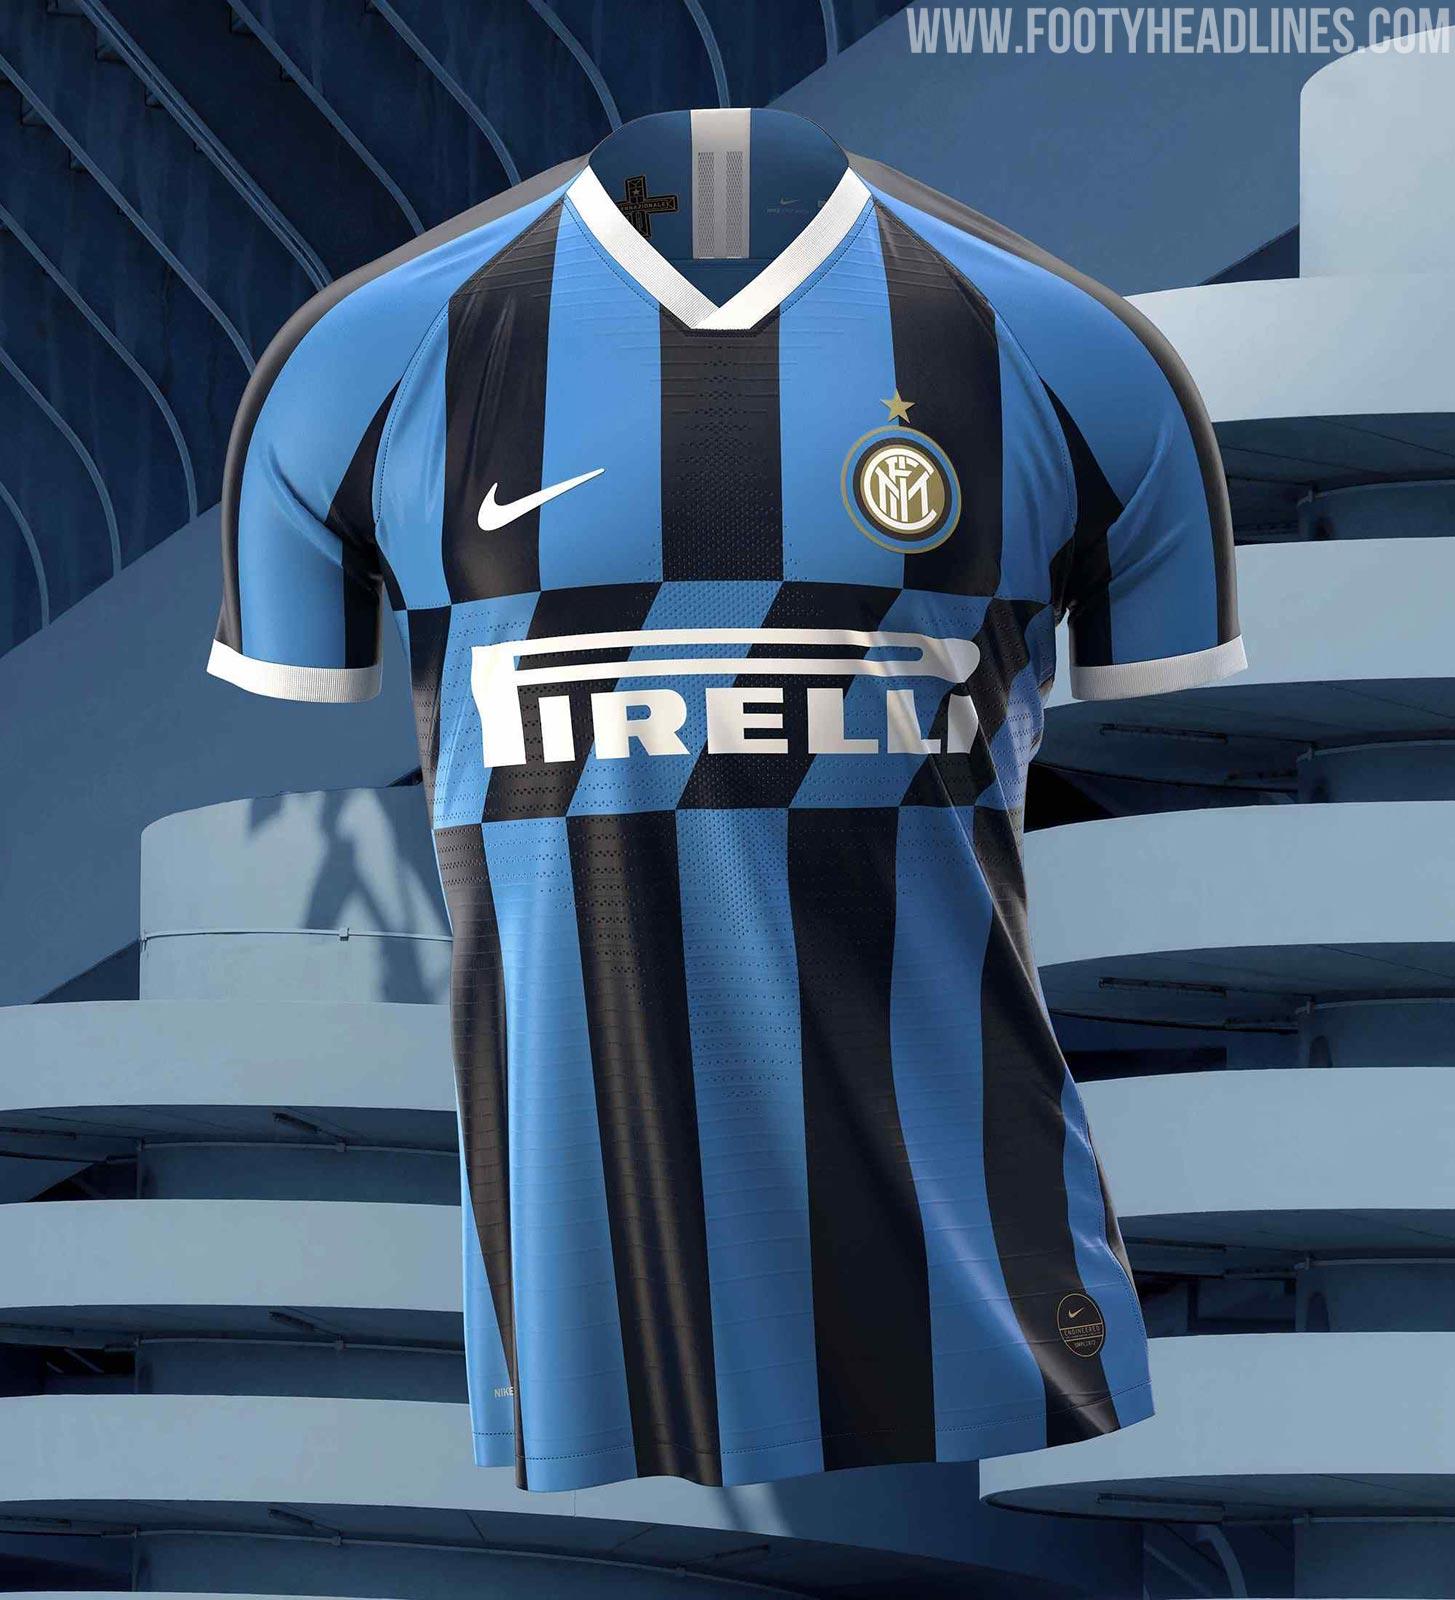 Inter Milan 19-20 Home Kit Revealed - Footy Headlines | Squadra di ...